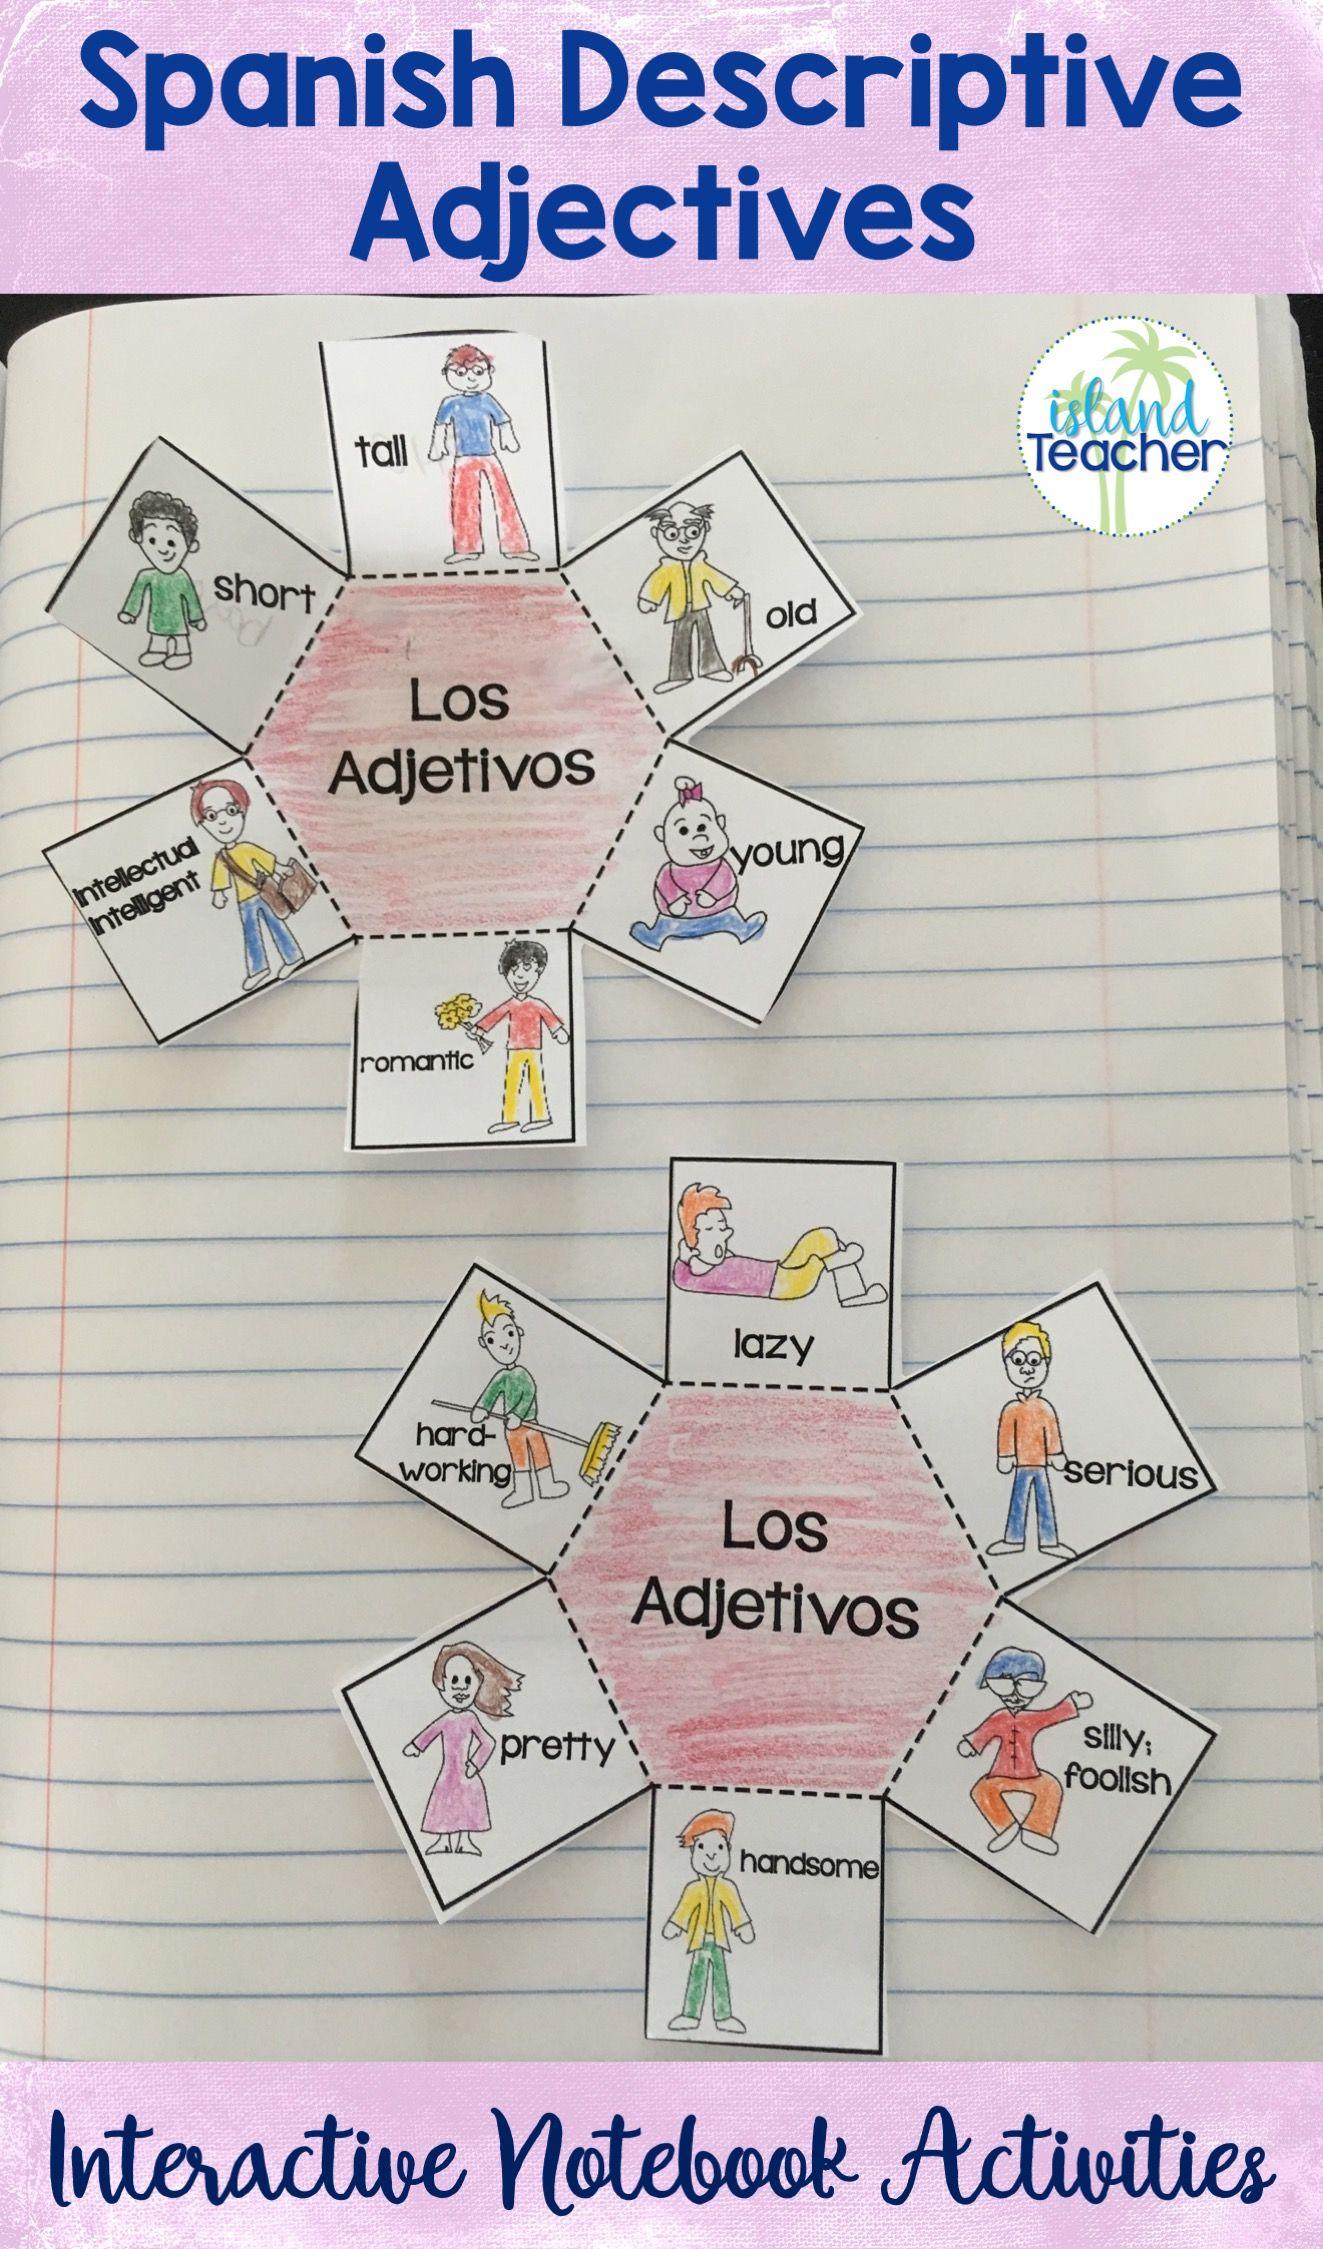 Spanish Descriptive Adjectives Interactive Notebook